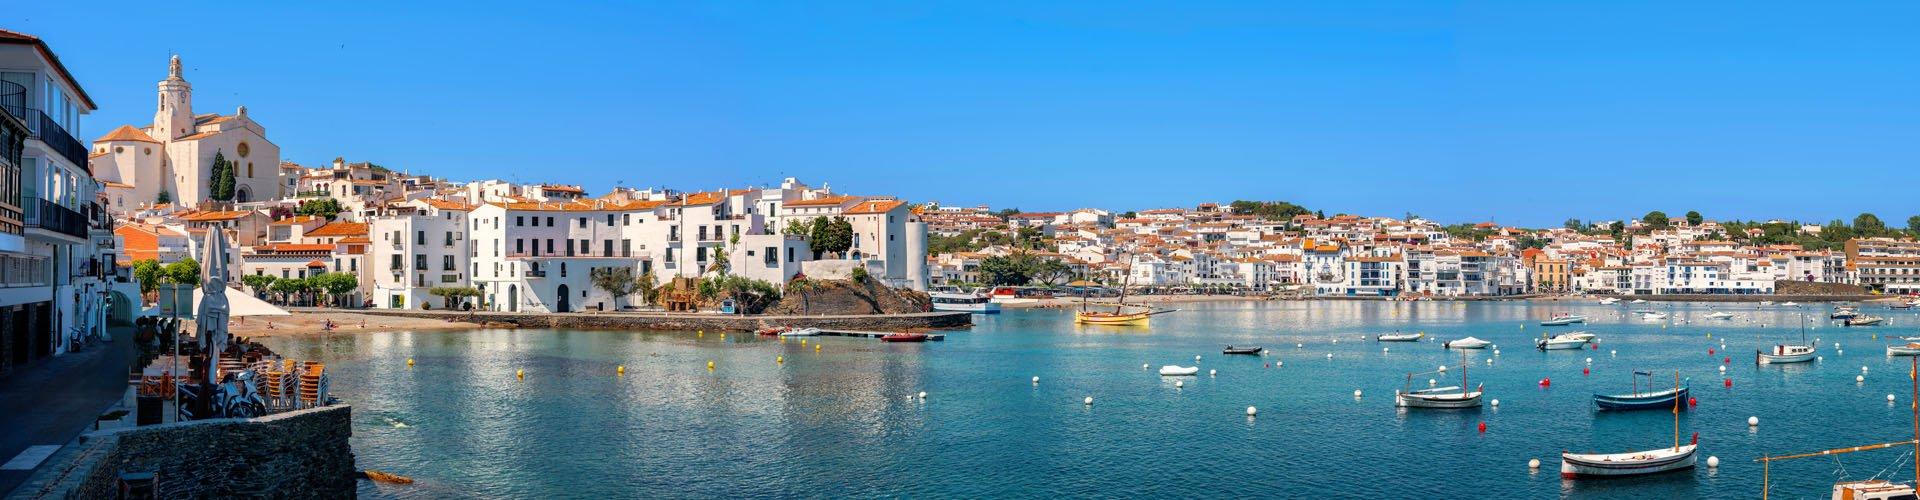 Spanje - pittoresk Cadaques